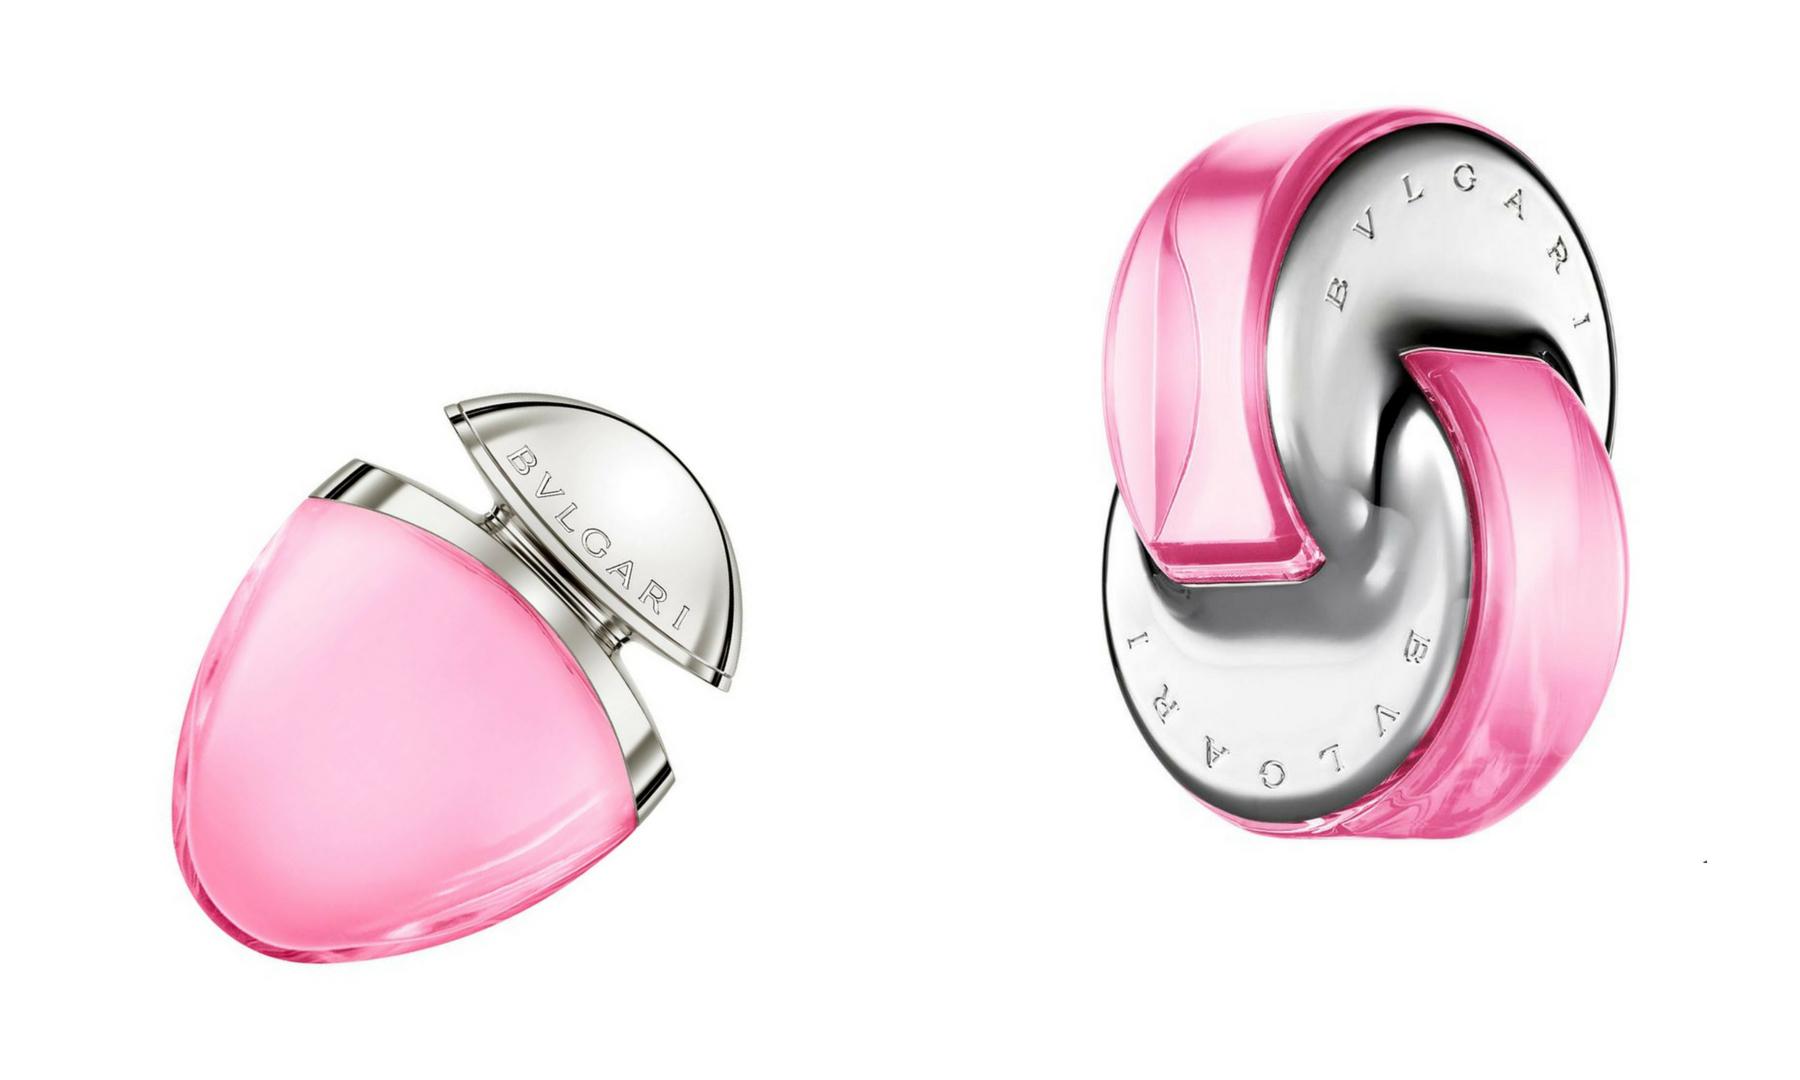 Bvlgari Omnia Pink Sapphire Eau de Toilette – Review